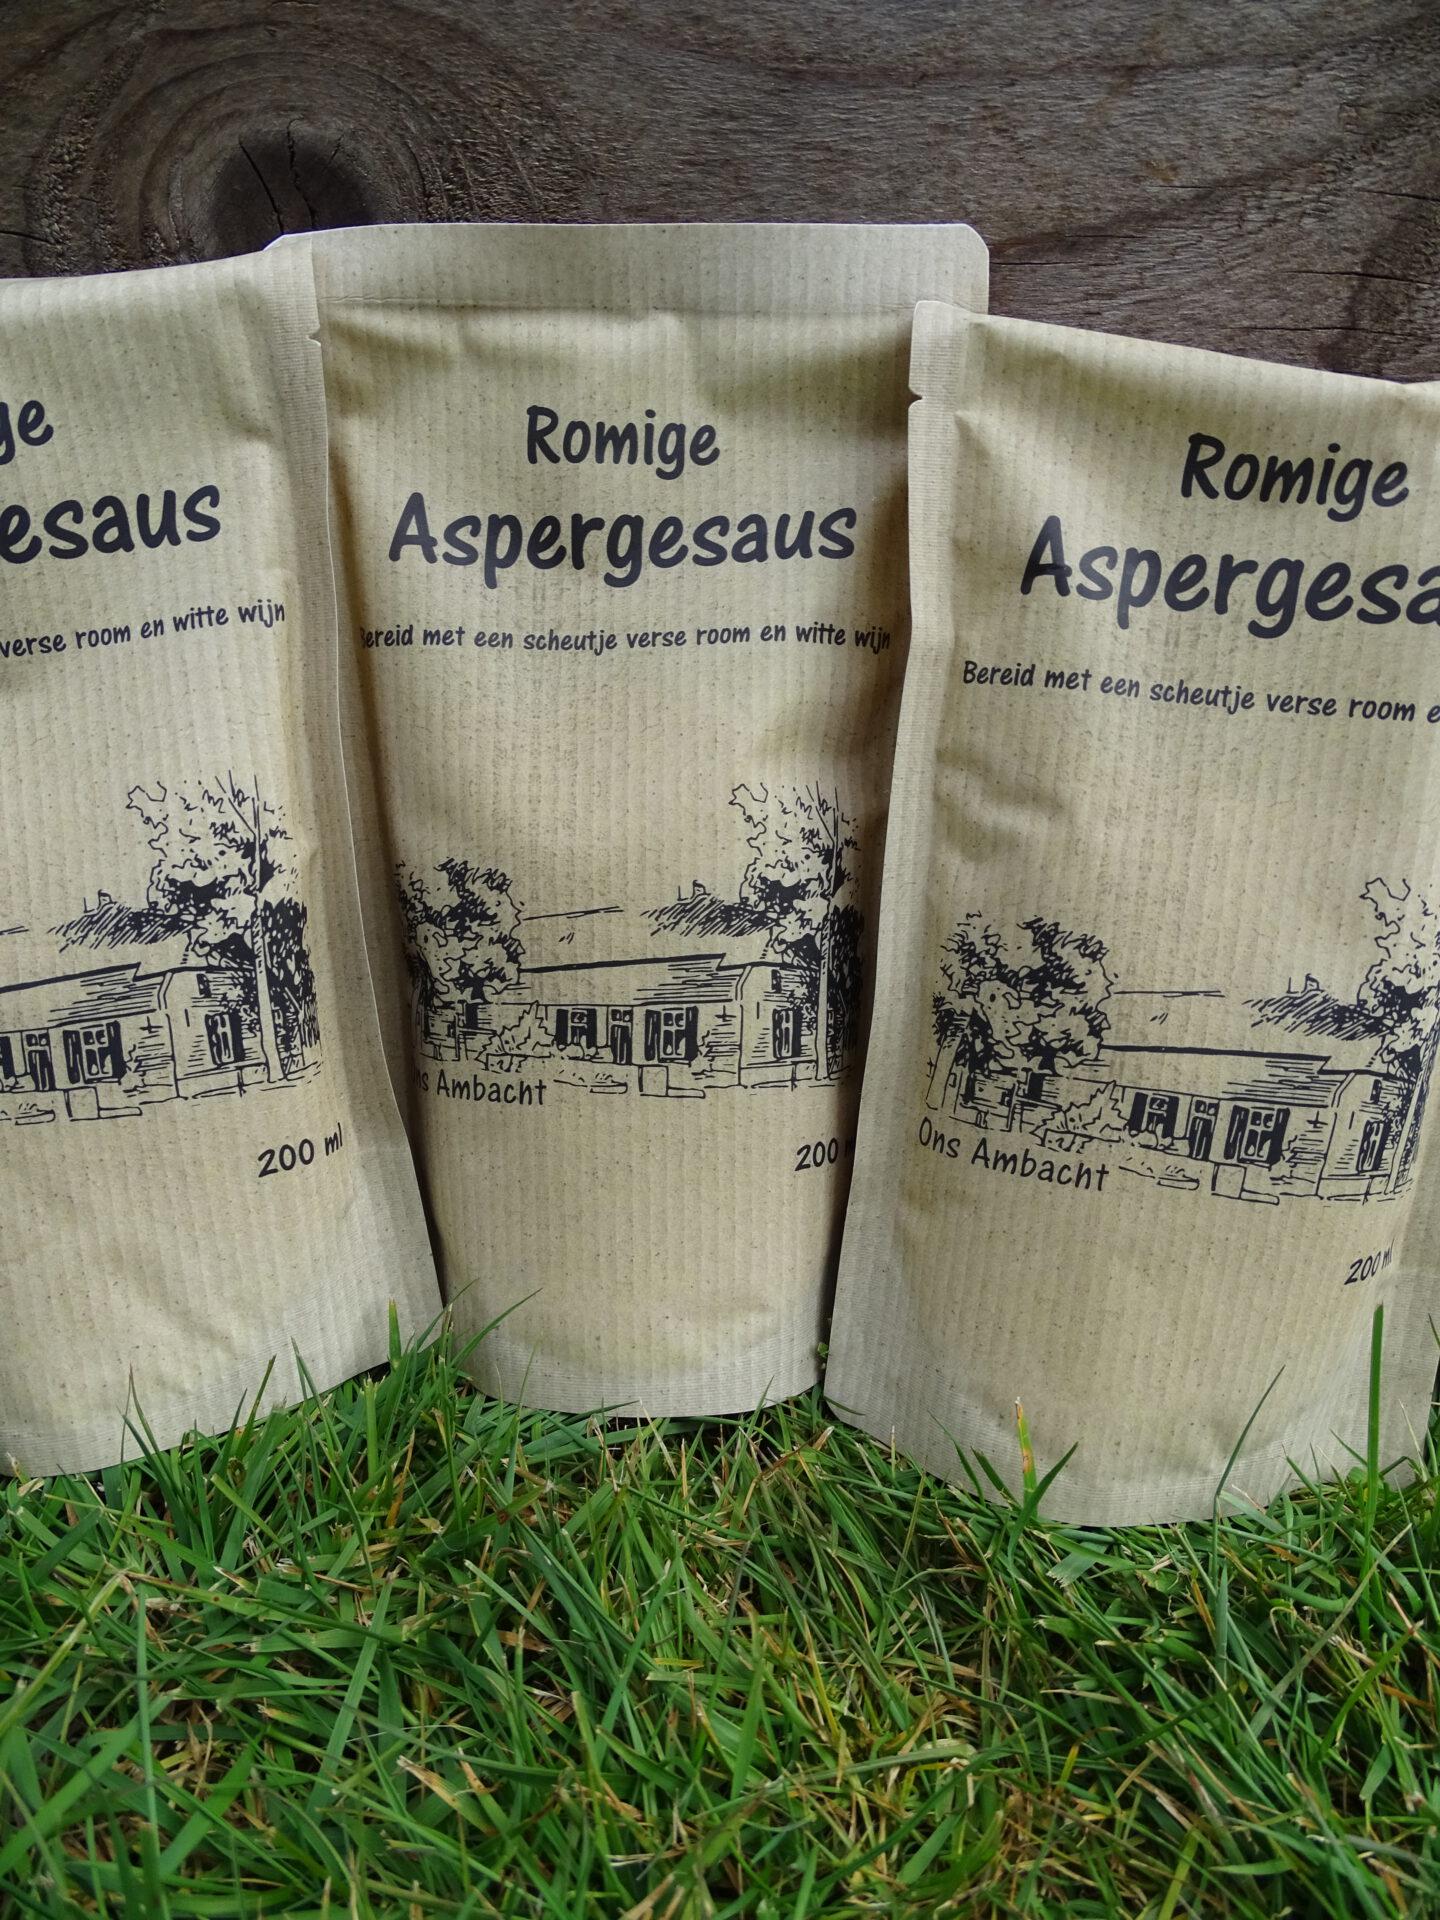 Romige aspergesaus